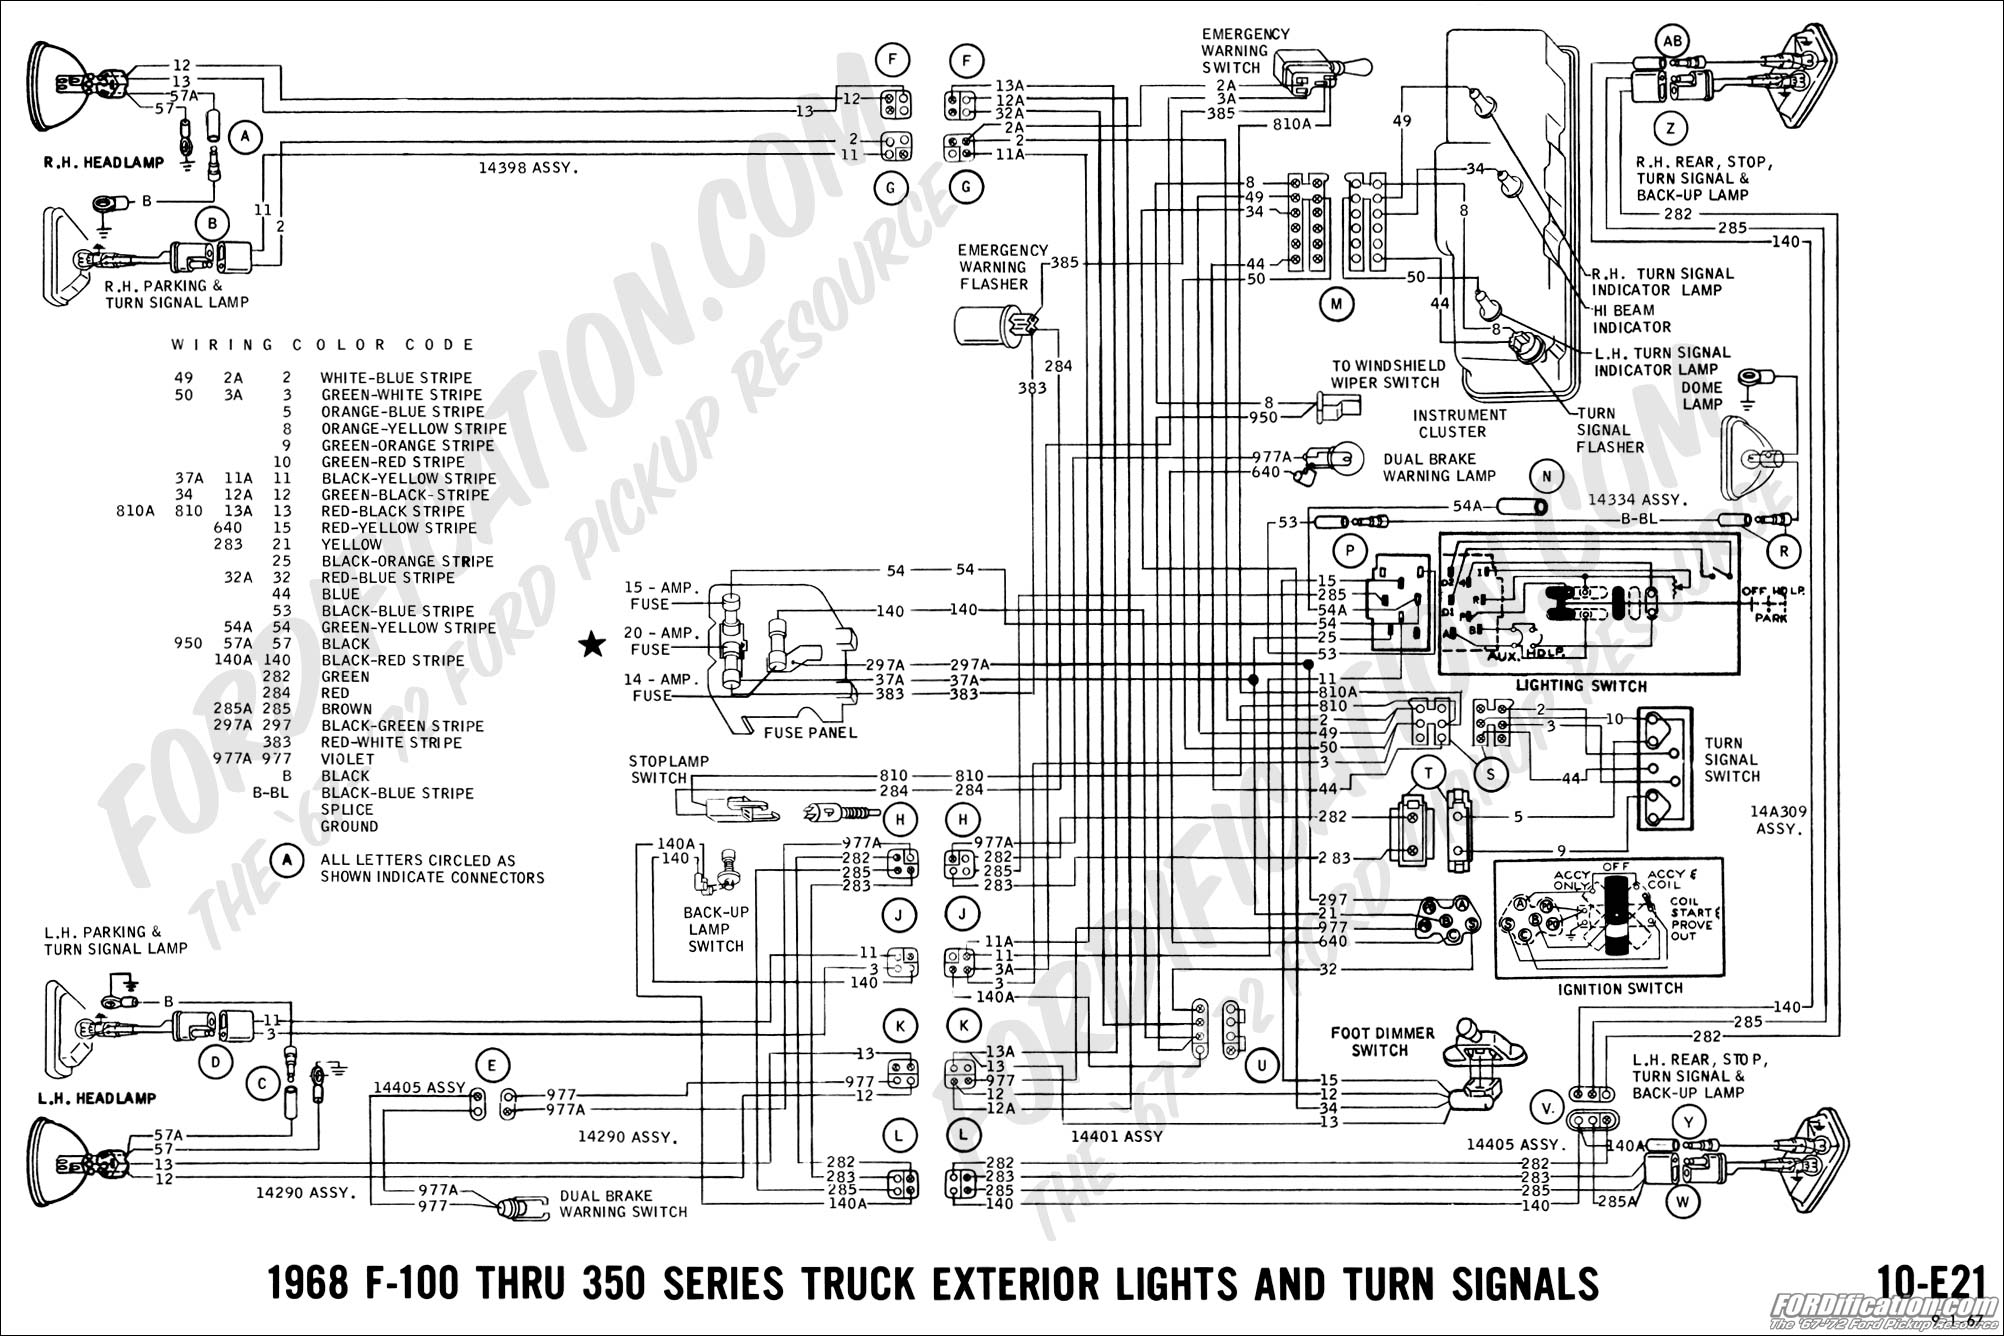 f100 wiring diagram ford ranger wiring diagram ford wiring 1955 Ford F100 V8 Wire Digram ford f wiring diagram wiring diagram 1978 ford f100 wiring harness diagrams 1955 Ford F100 Interior